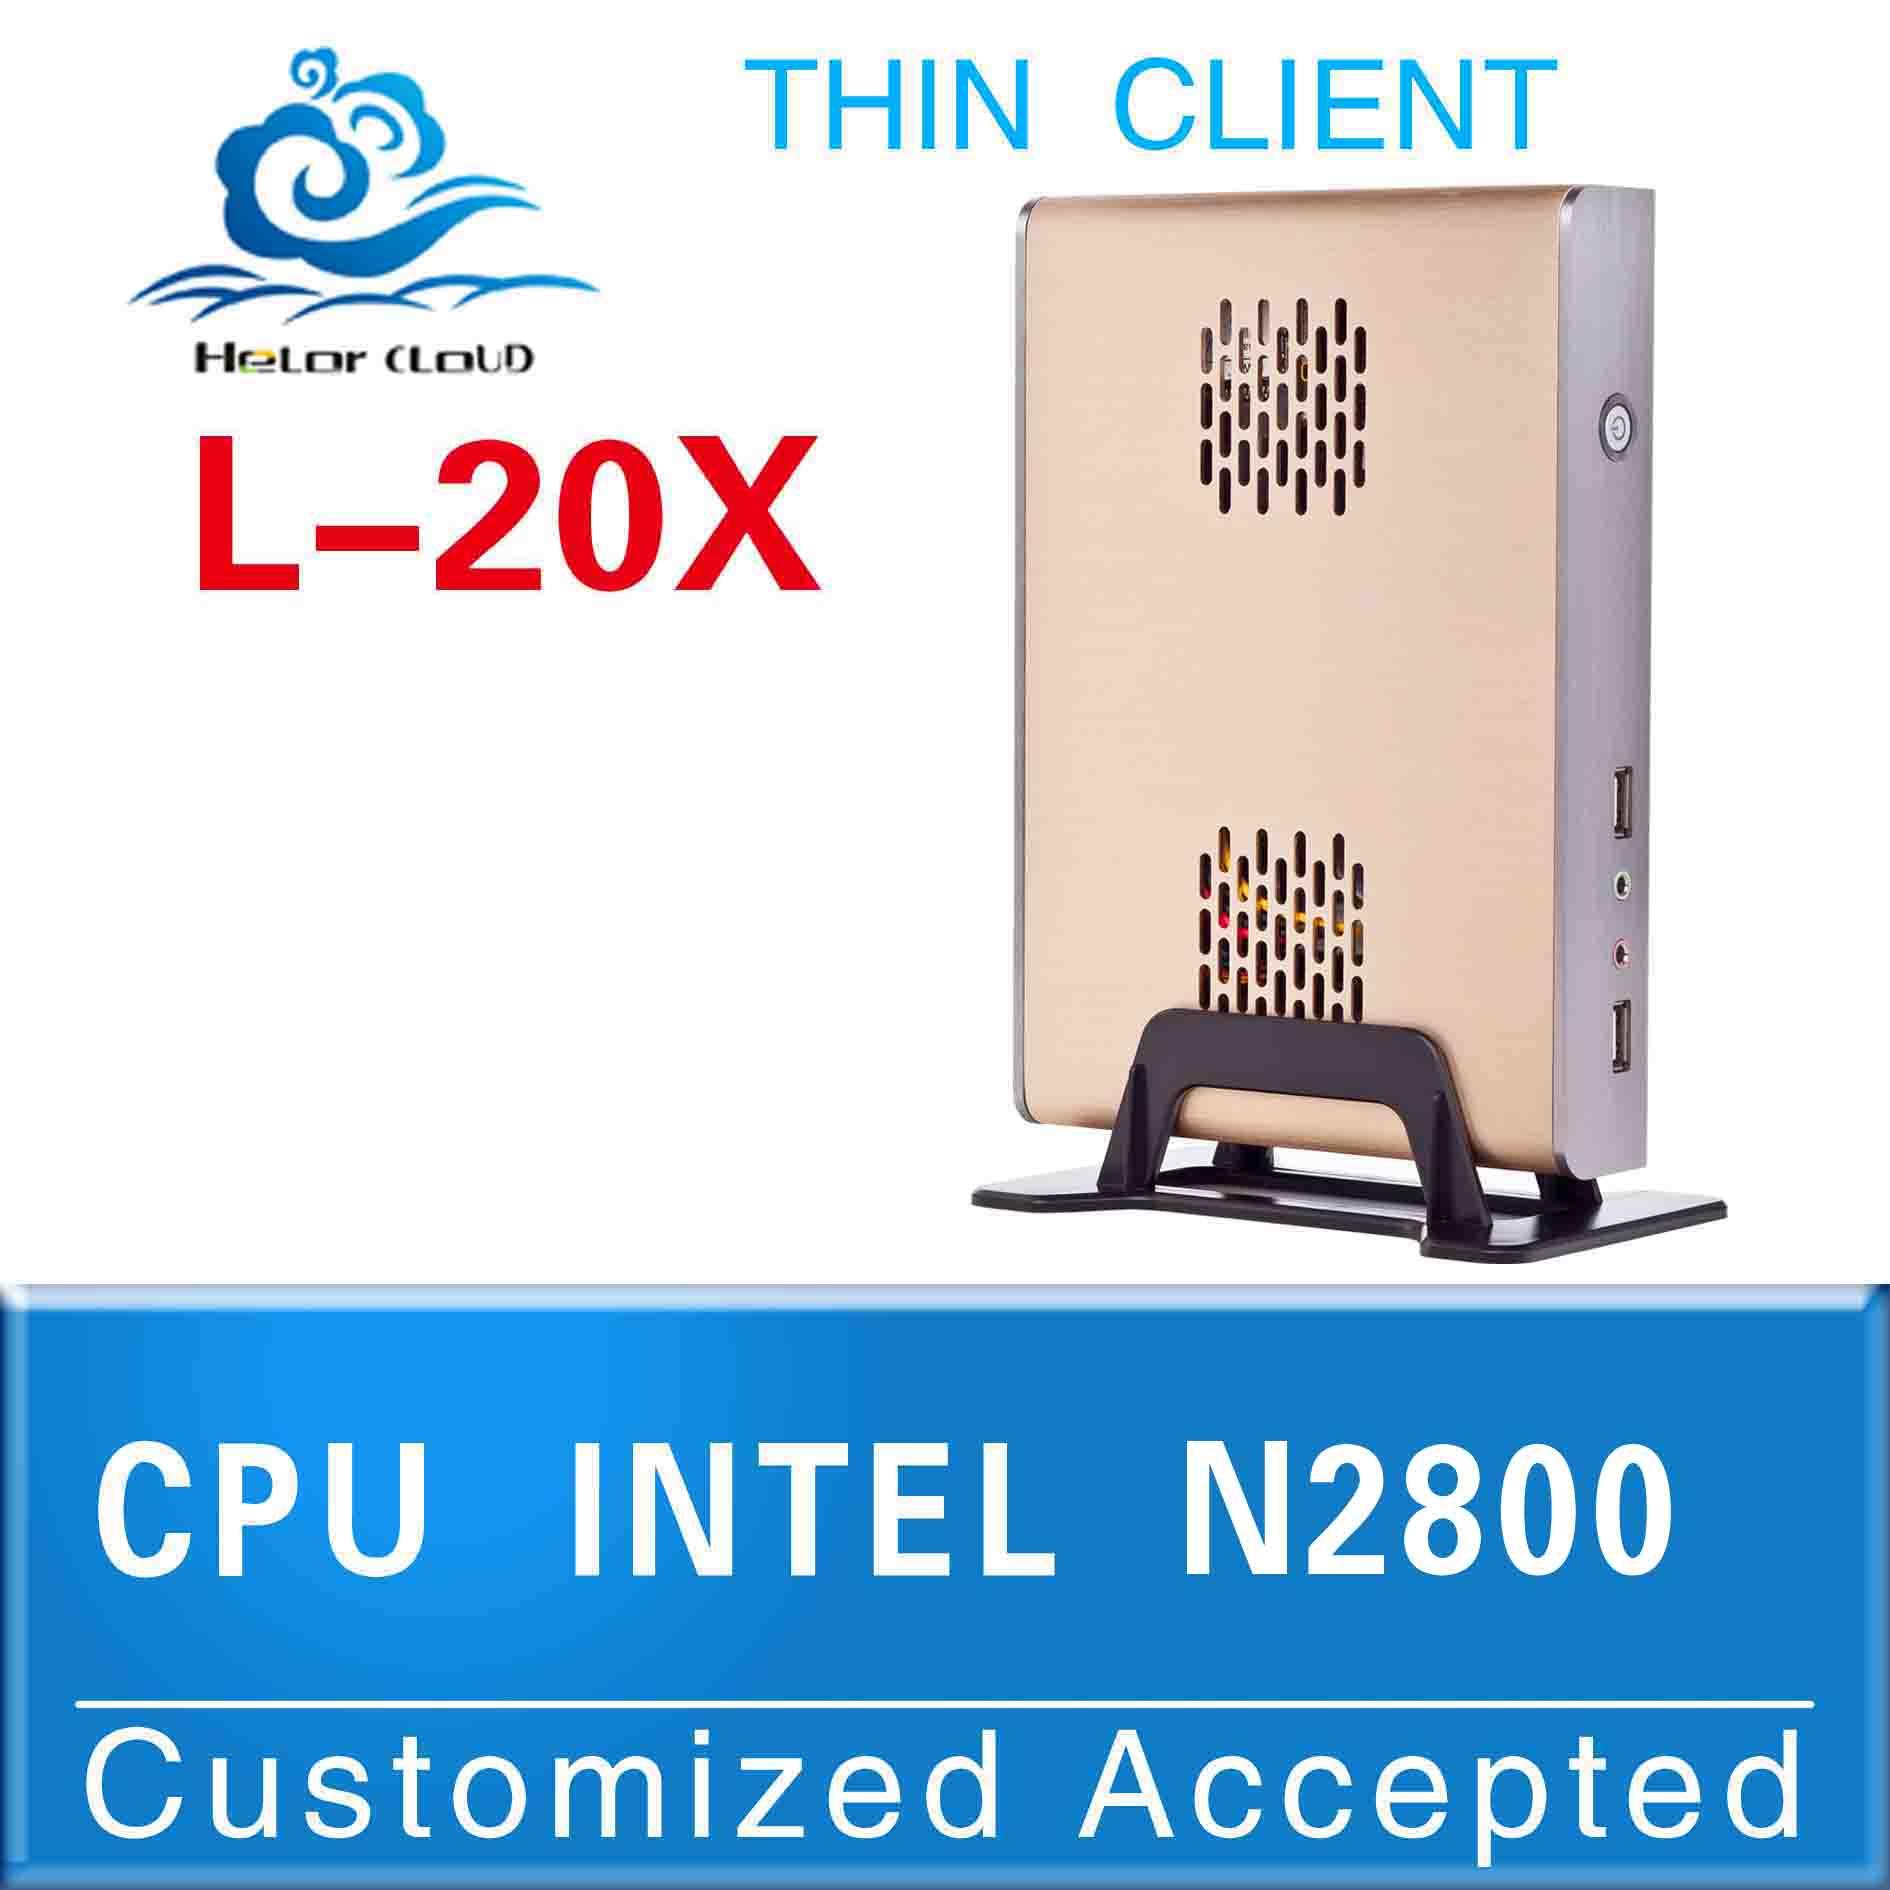 cheap ! L-20x,1080P Slim desktop computer Desktop computers thin client linux hdmi support Ubuntu Linux 12.04(China (Mainland))